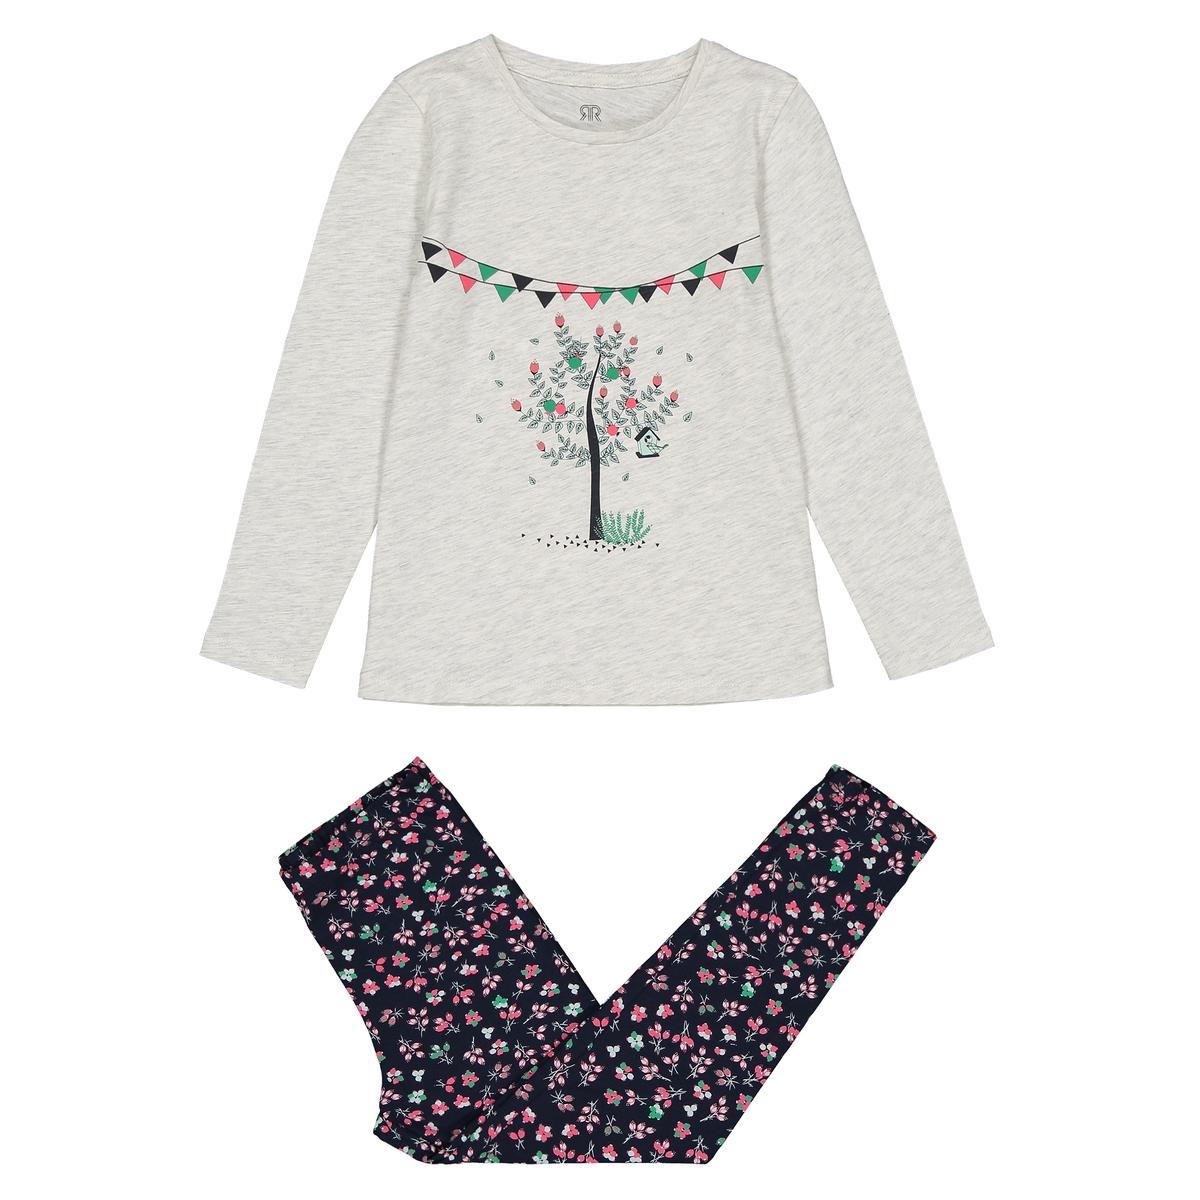 Пижама с футболкой и леггинсами, 3-12 лет La Redoute Collections